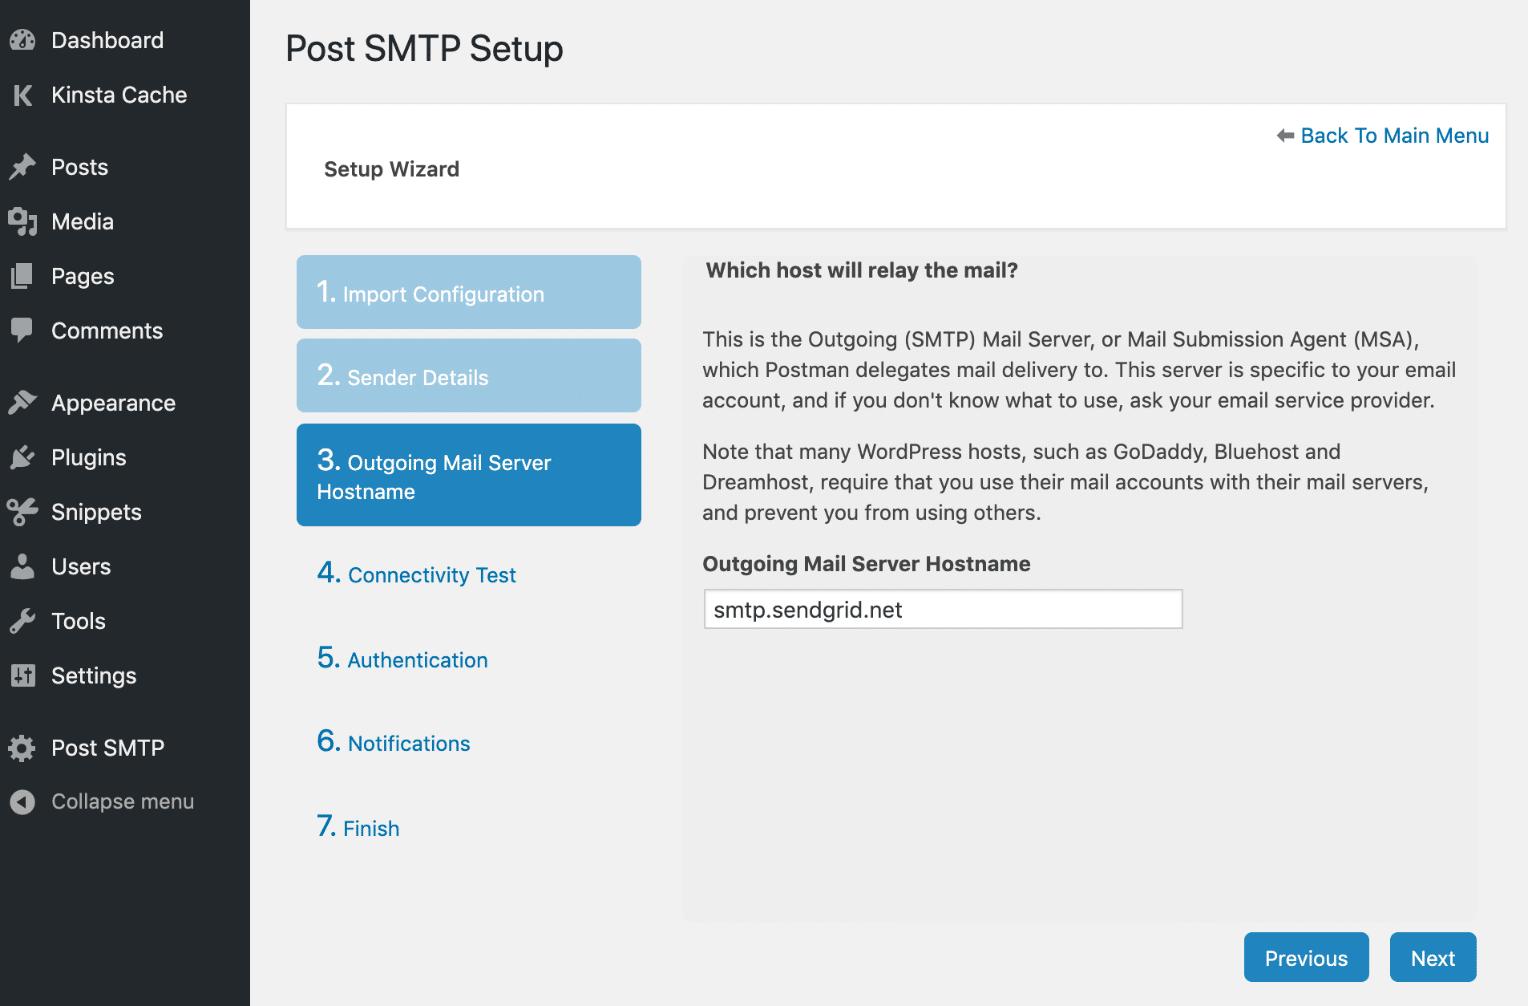 Post SMTP Outgoing Mail Server Hostname